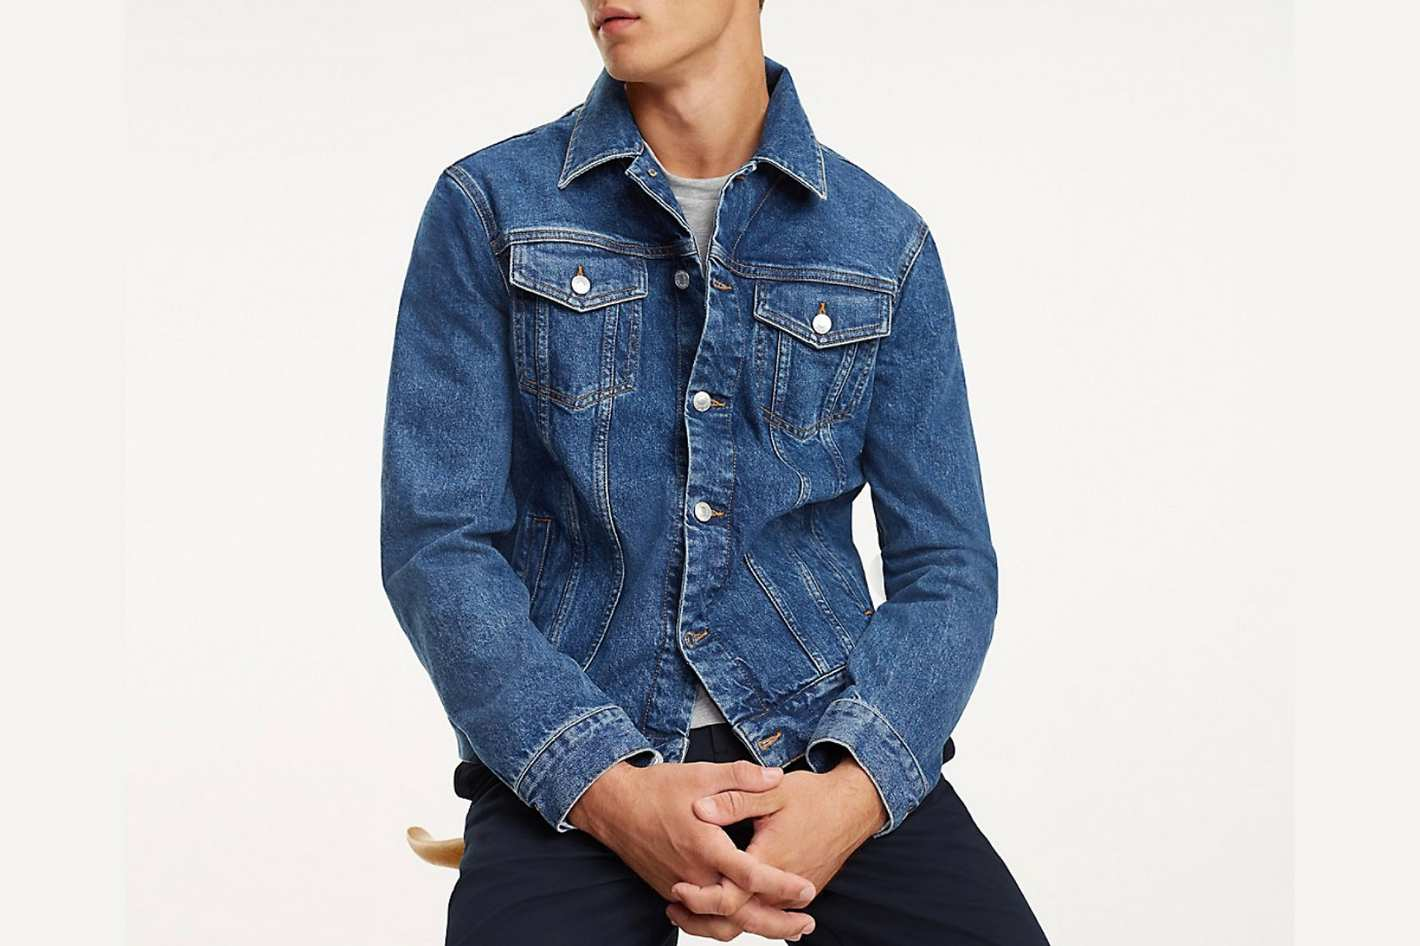 Tommy Hilfiger Icon Trucker Jacket